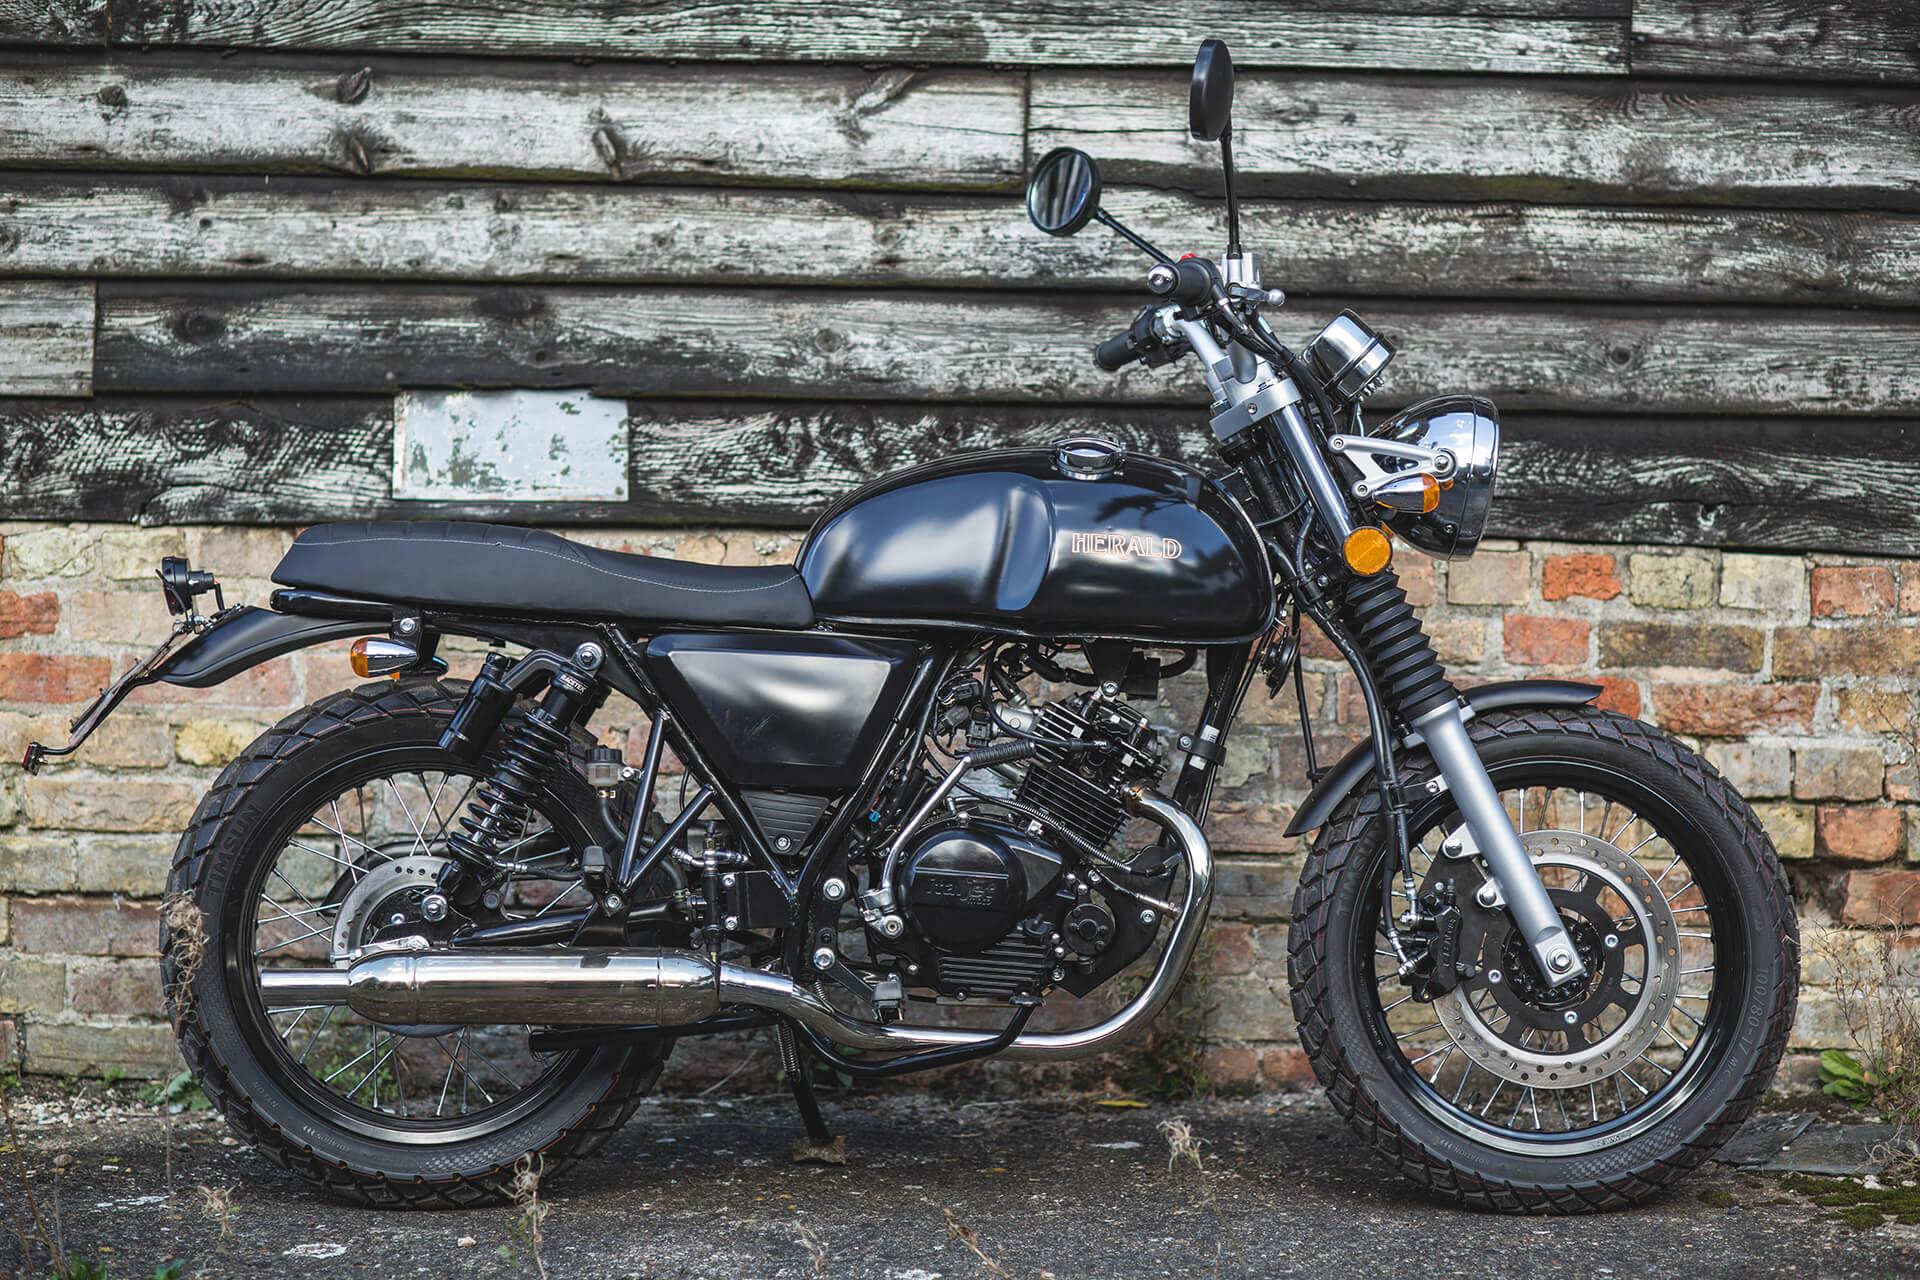 Maverick motorcycle